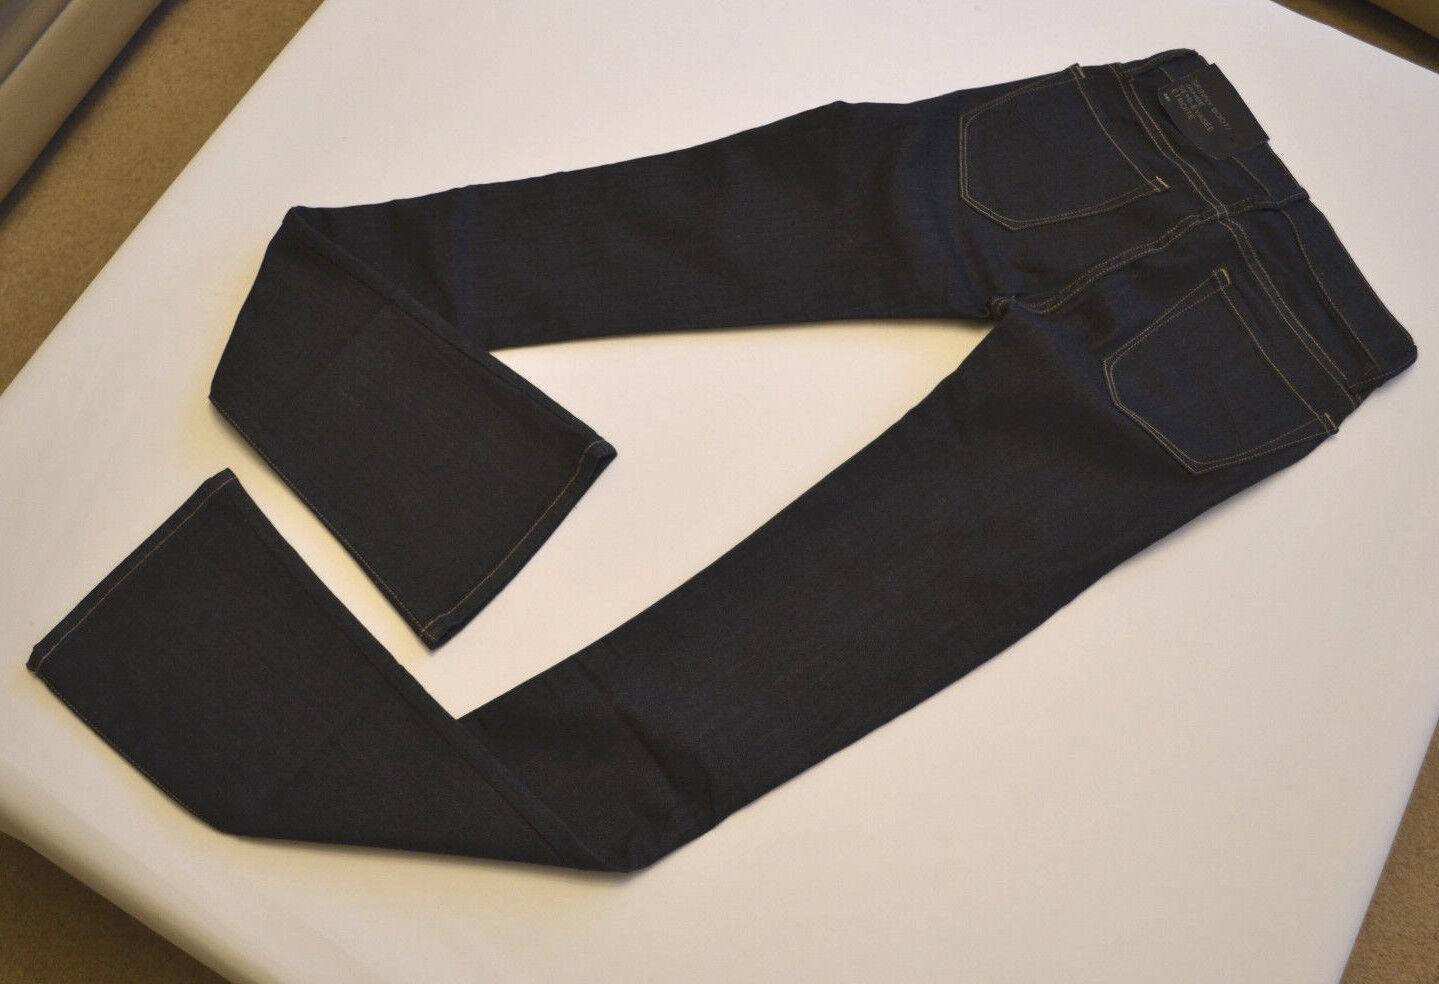 Jeans DA DONNA DONNA DONNA ARMANI skinny avviocut Blu Navy Sz. 24R Label-ACTUAL W26 L34.5 cbe11f